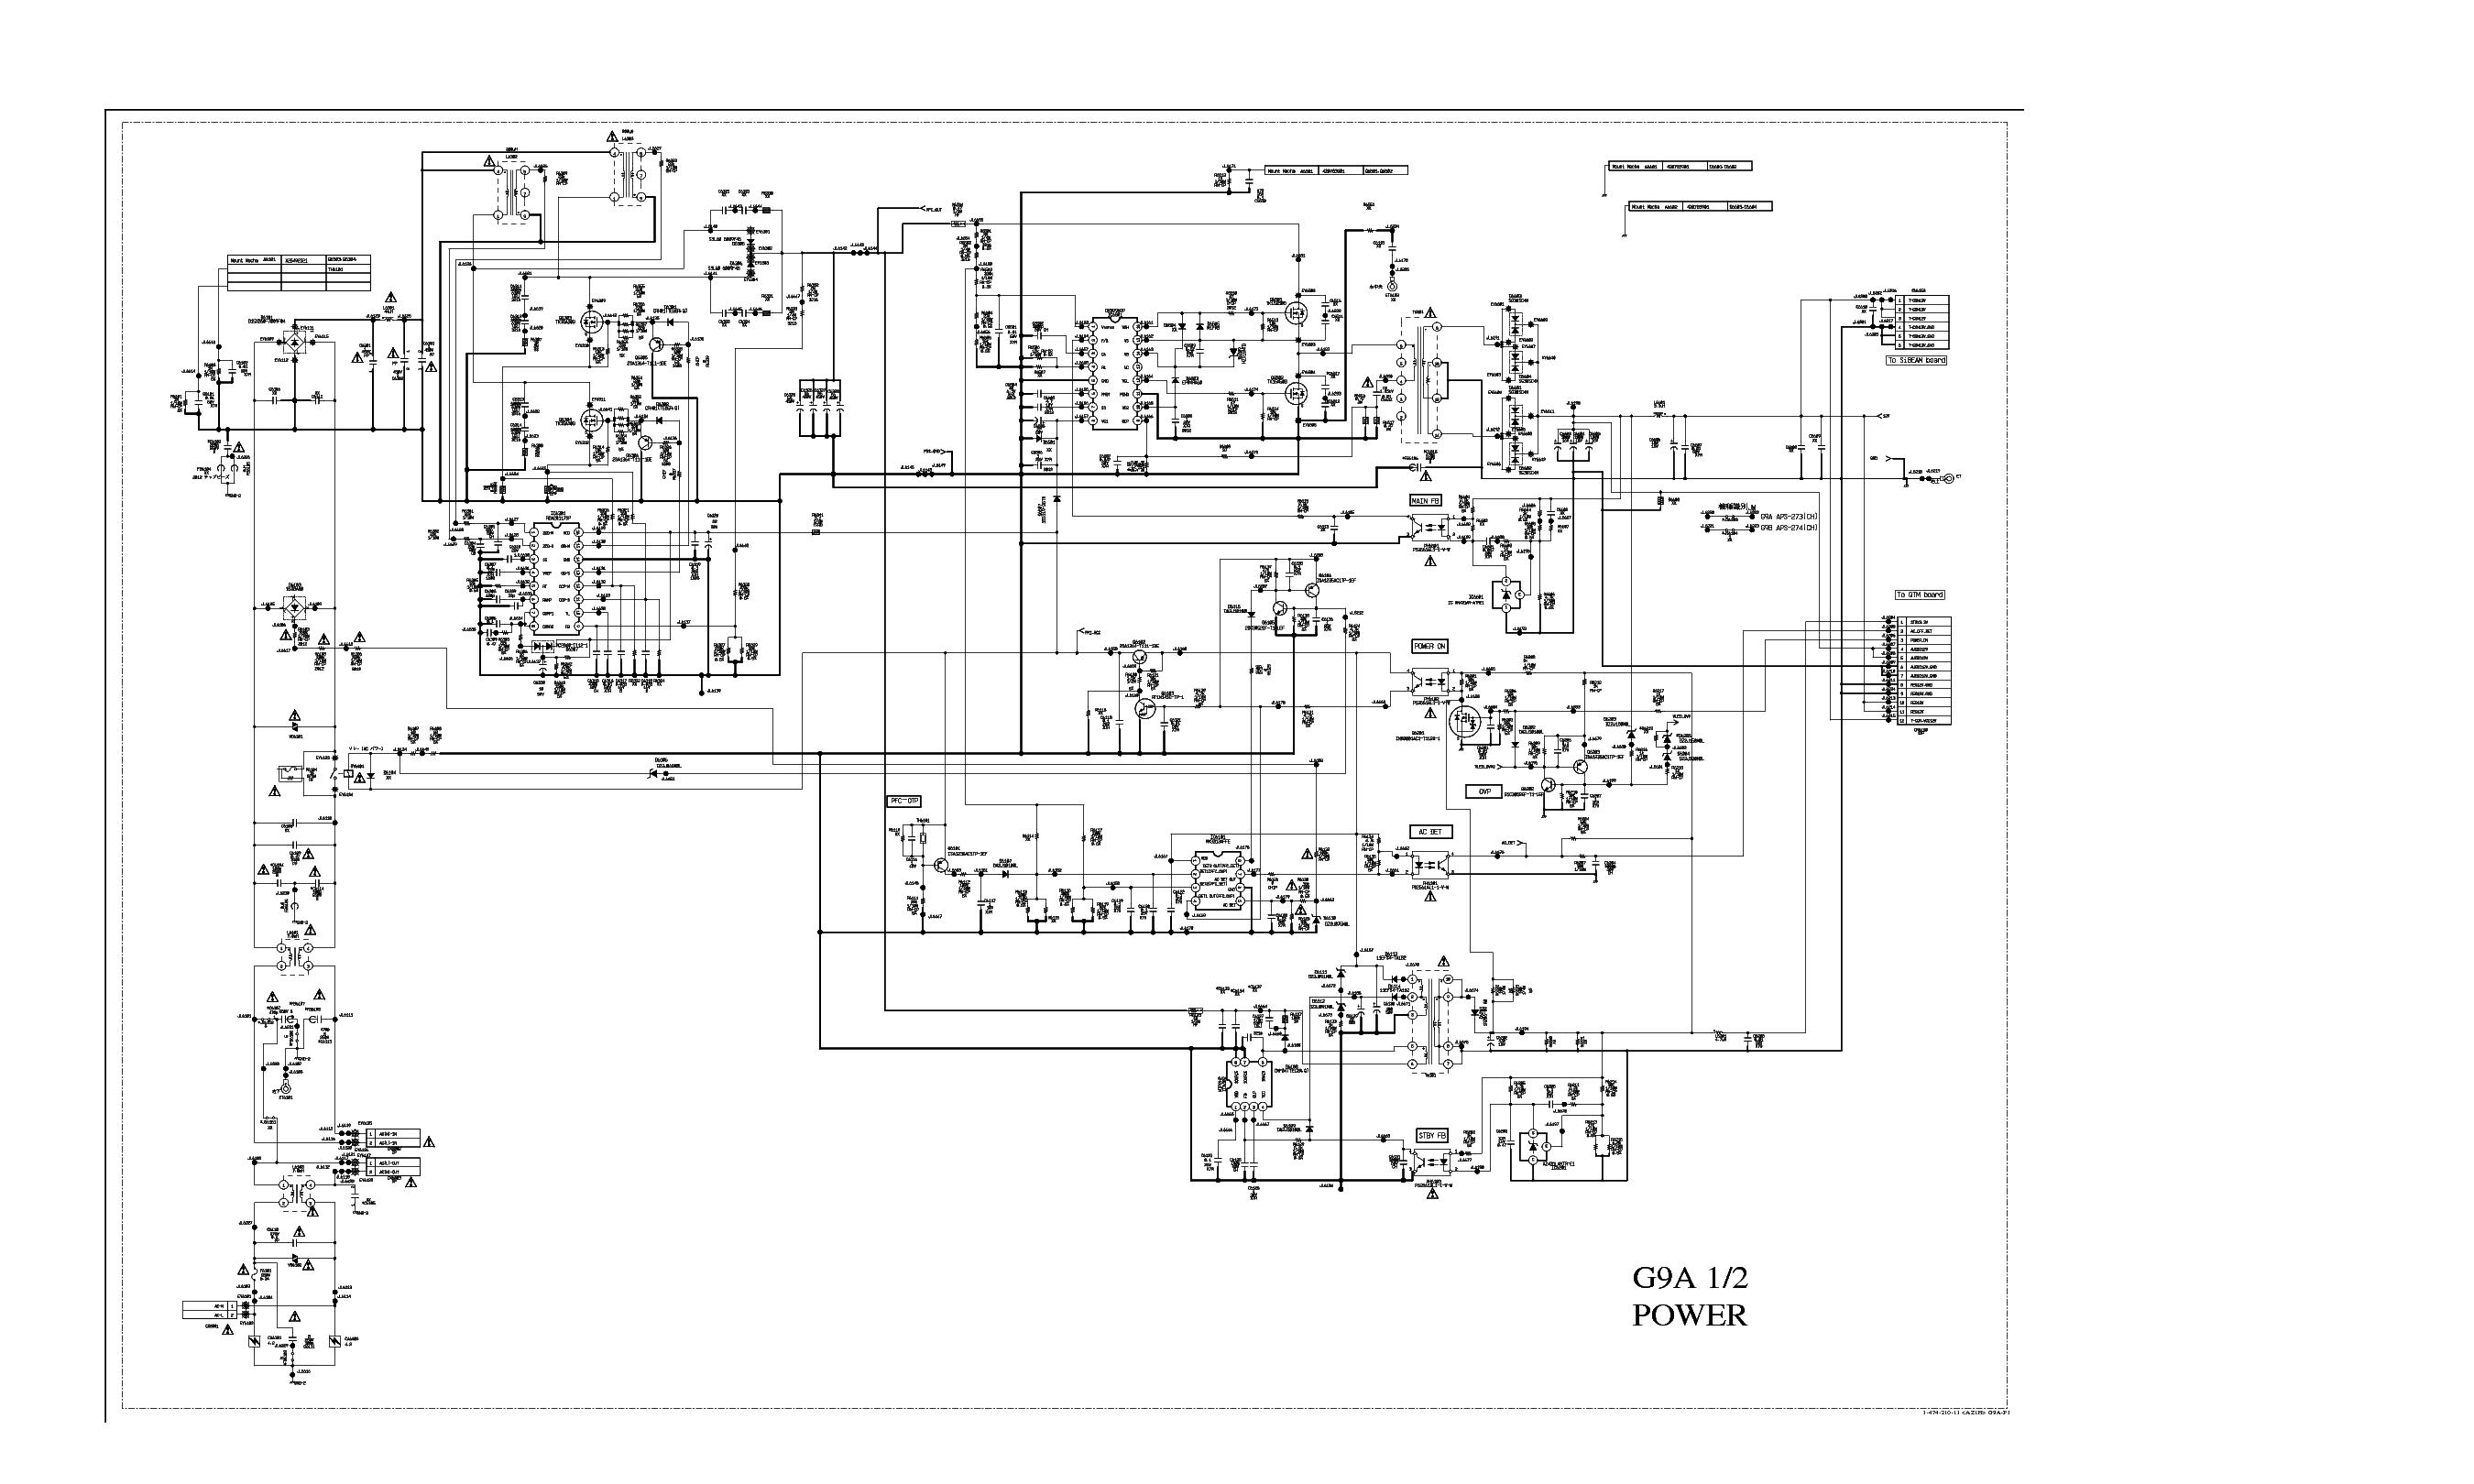 sony g9a mip2h2 mm3313a r2a20117sp cxd9969p sch service manual download  schematics  eeprom